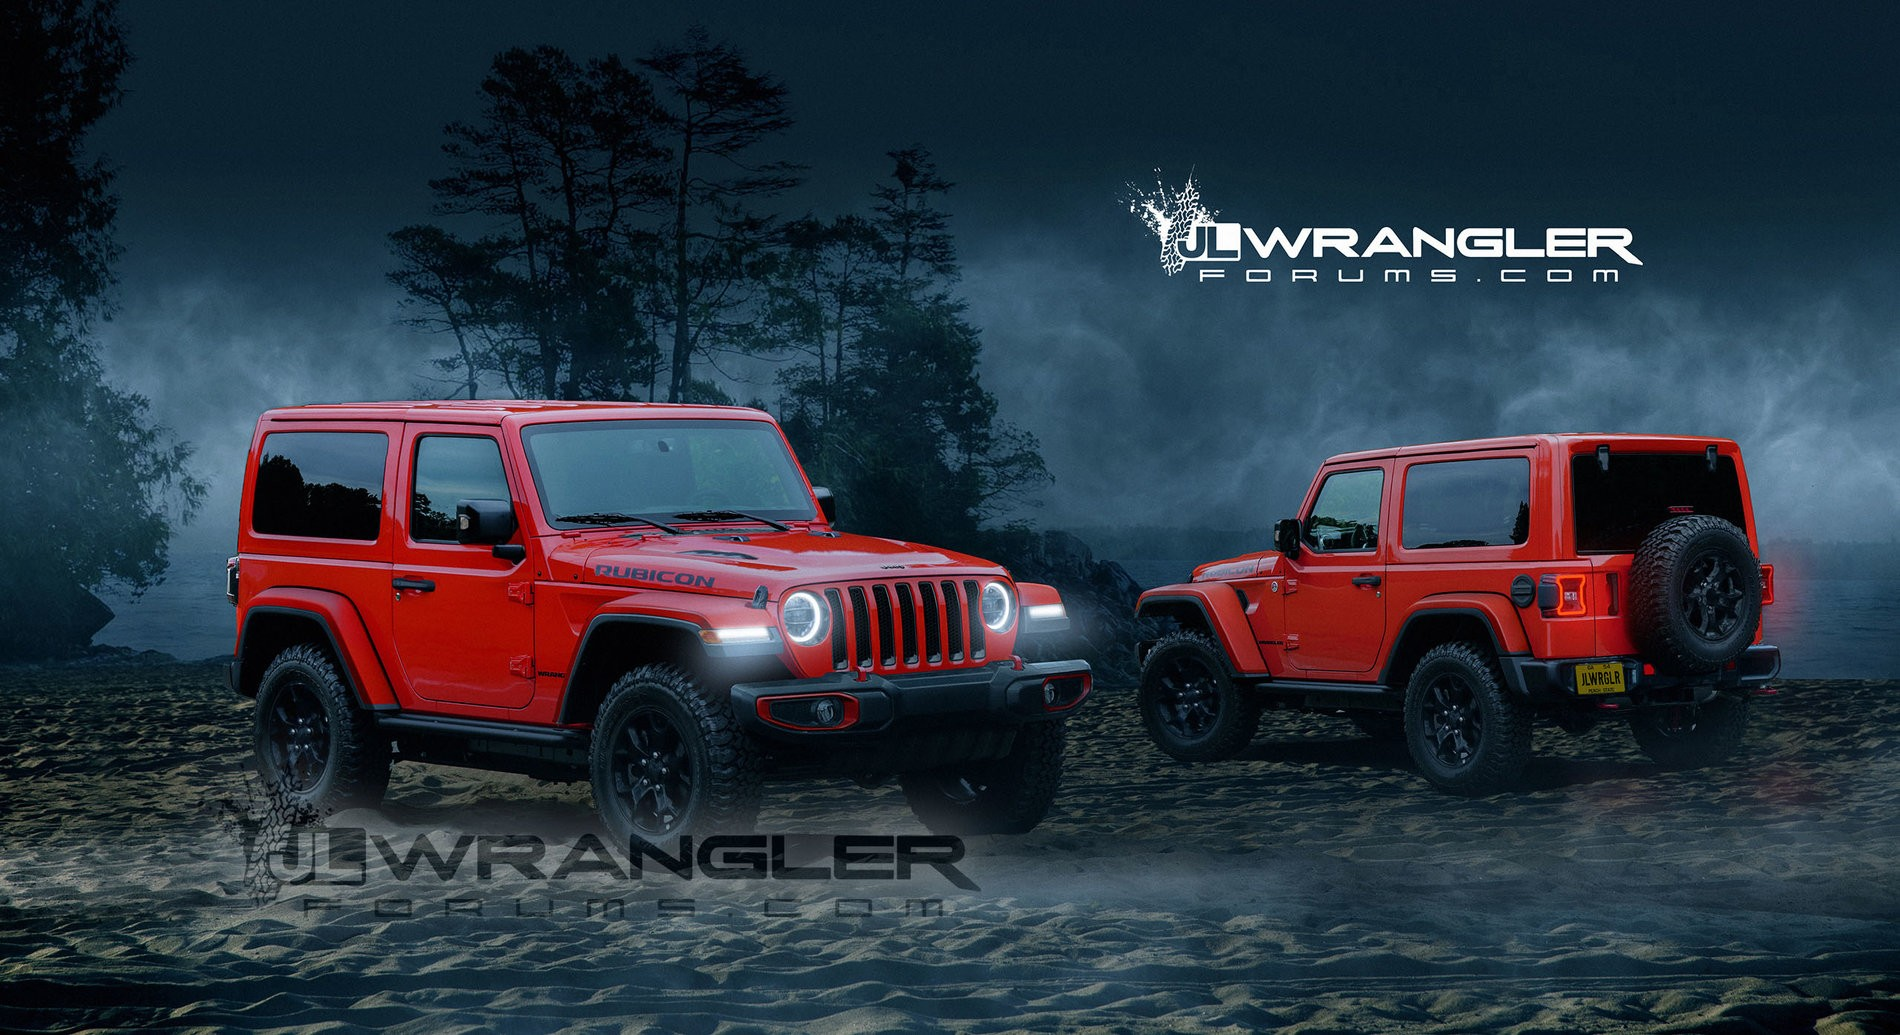 2018 jeep wrangler jl. perfect 2018 2018 jeep wrangler jl rendering based on spy photos with jeep wrangler jl 0